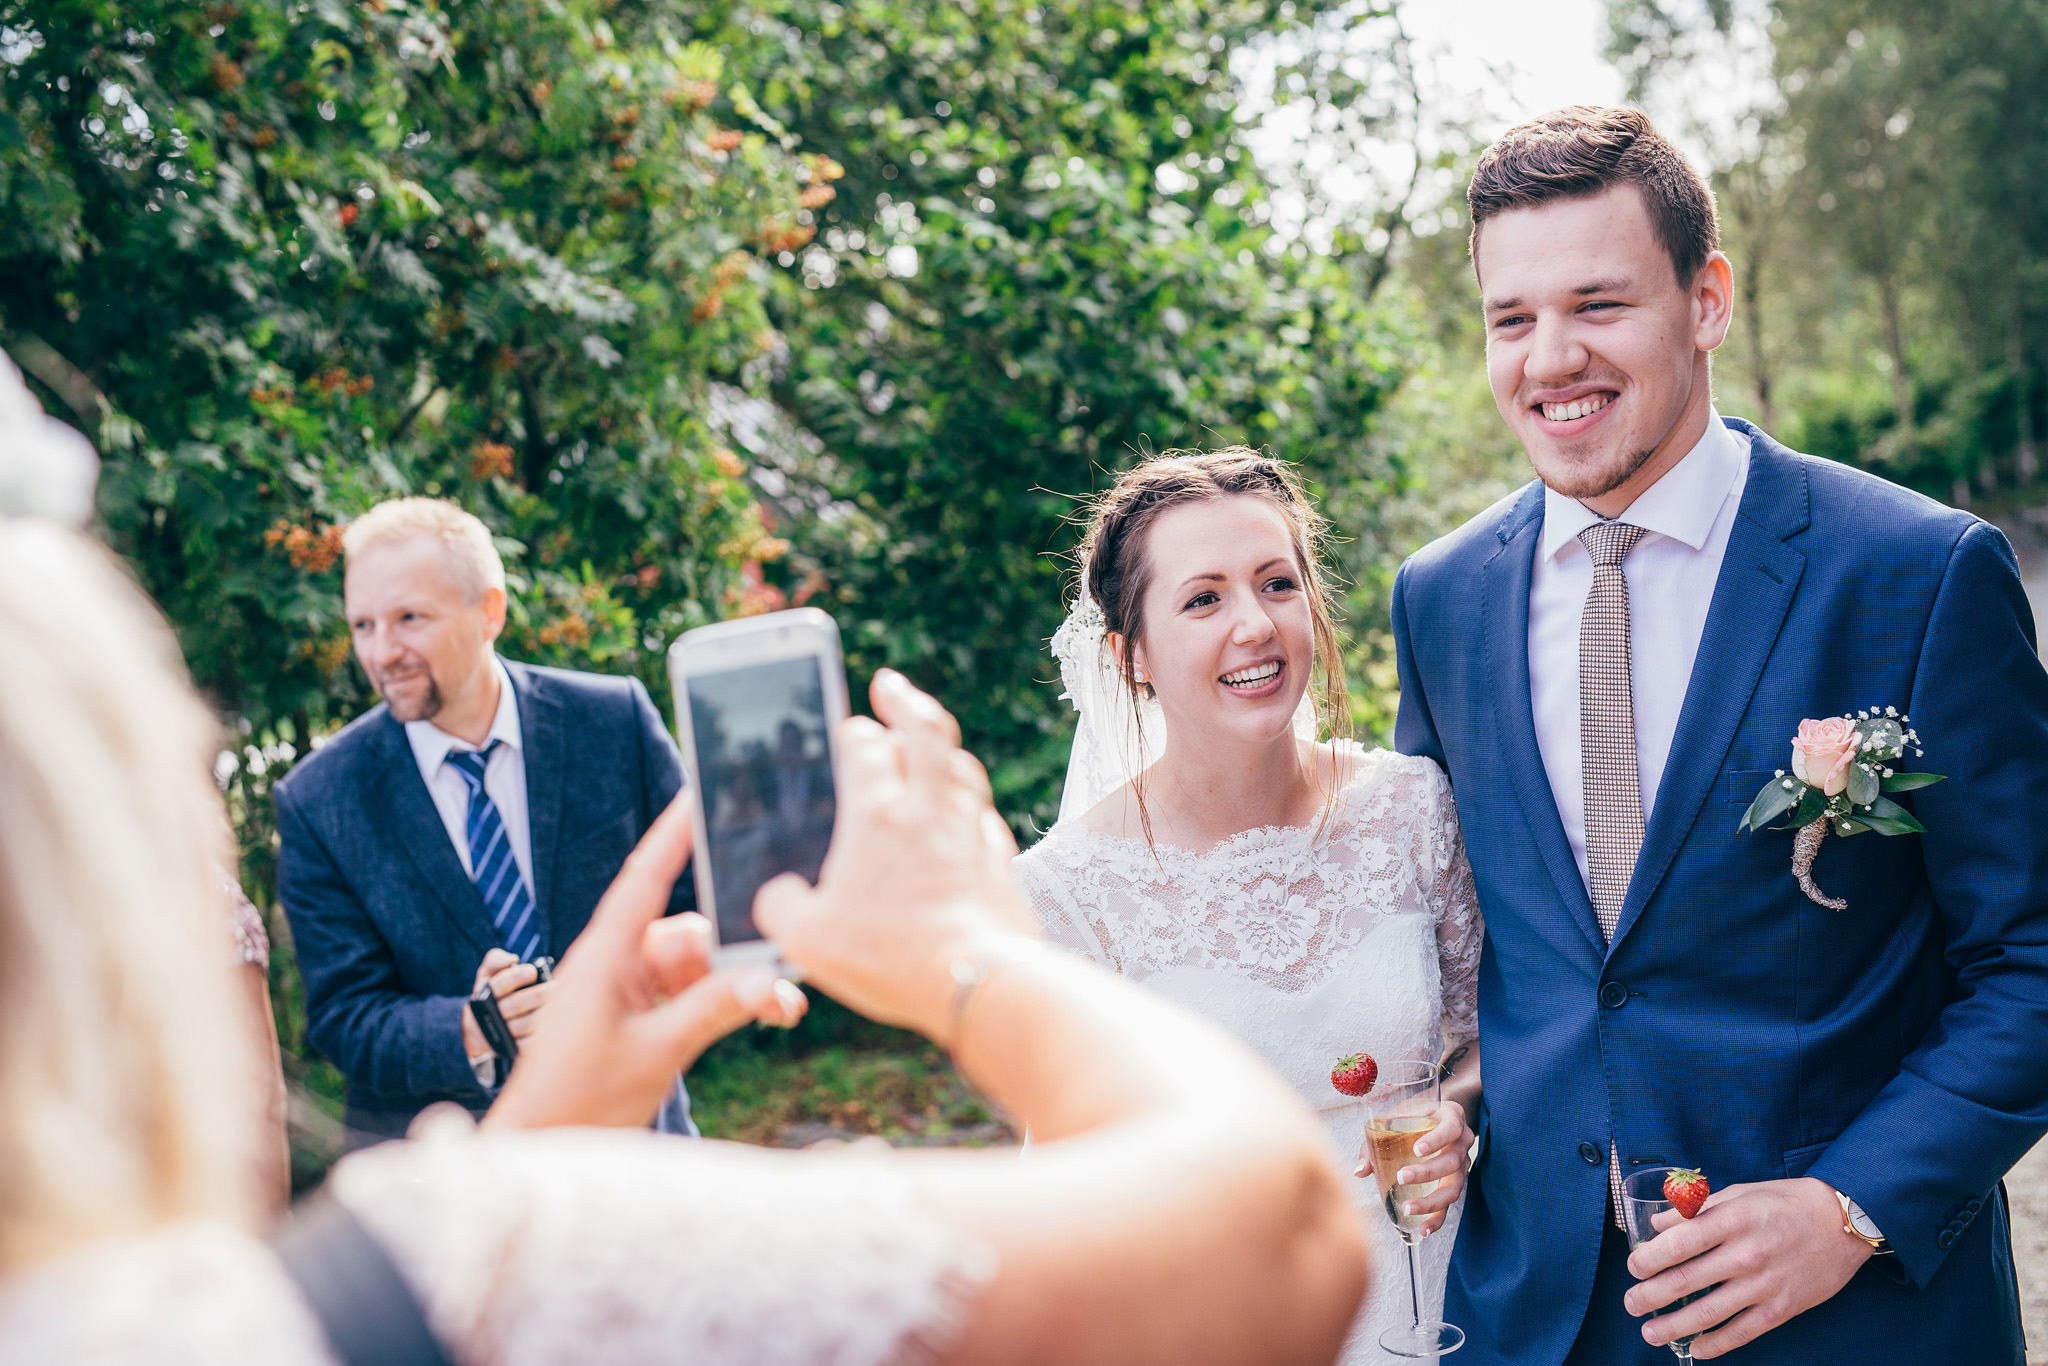 Norway+wedding+photographer+elopement+pre+wedding+Casey+Arneson-98.jpg